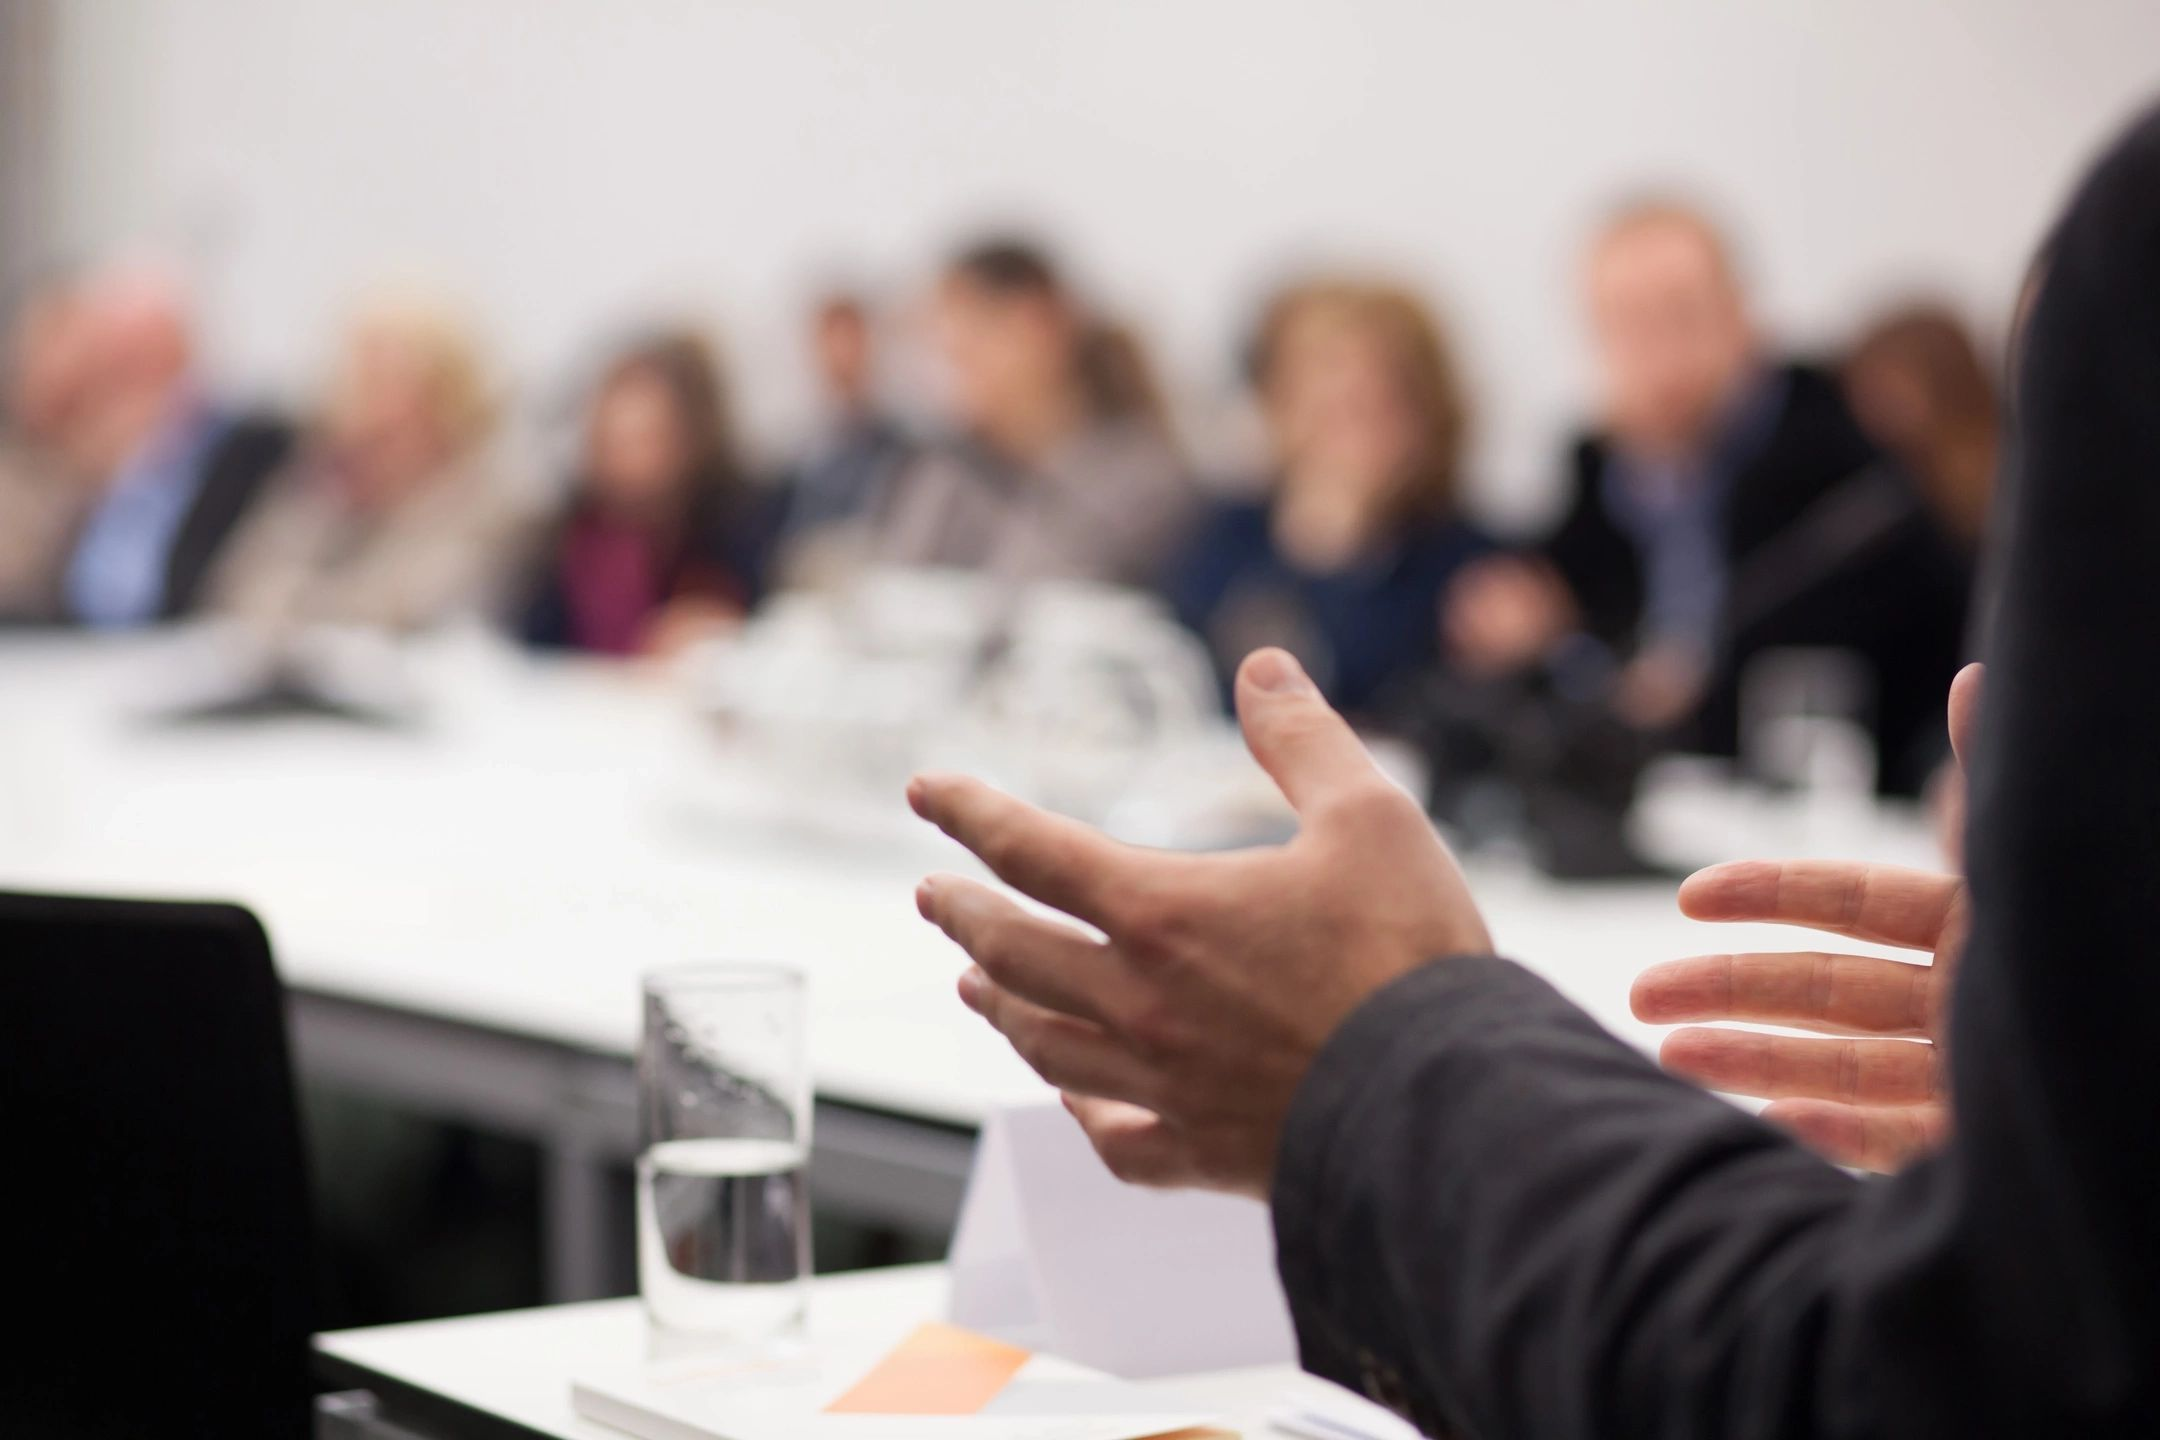 The Conversation Demands Dialogue To Make Change Stick by David Guerra